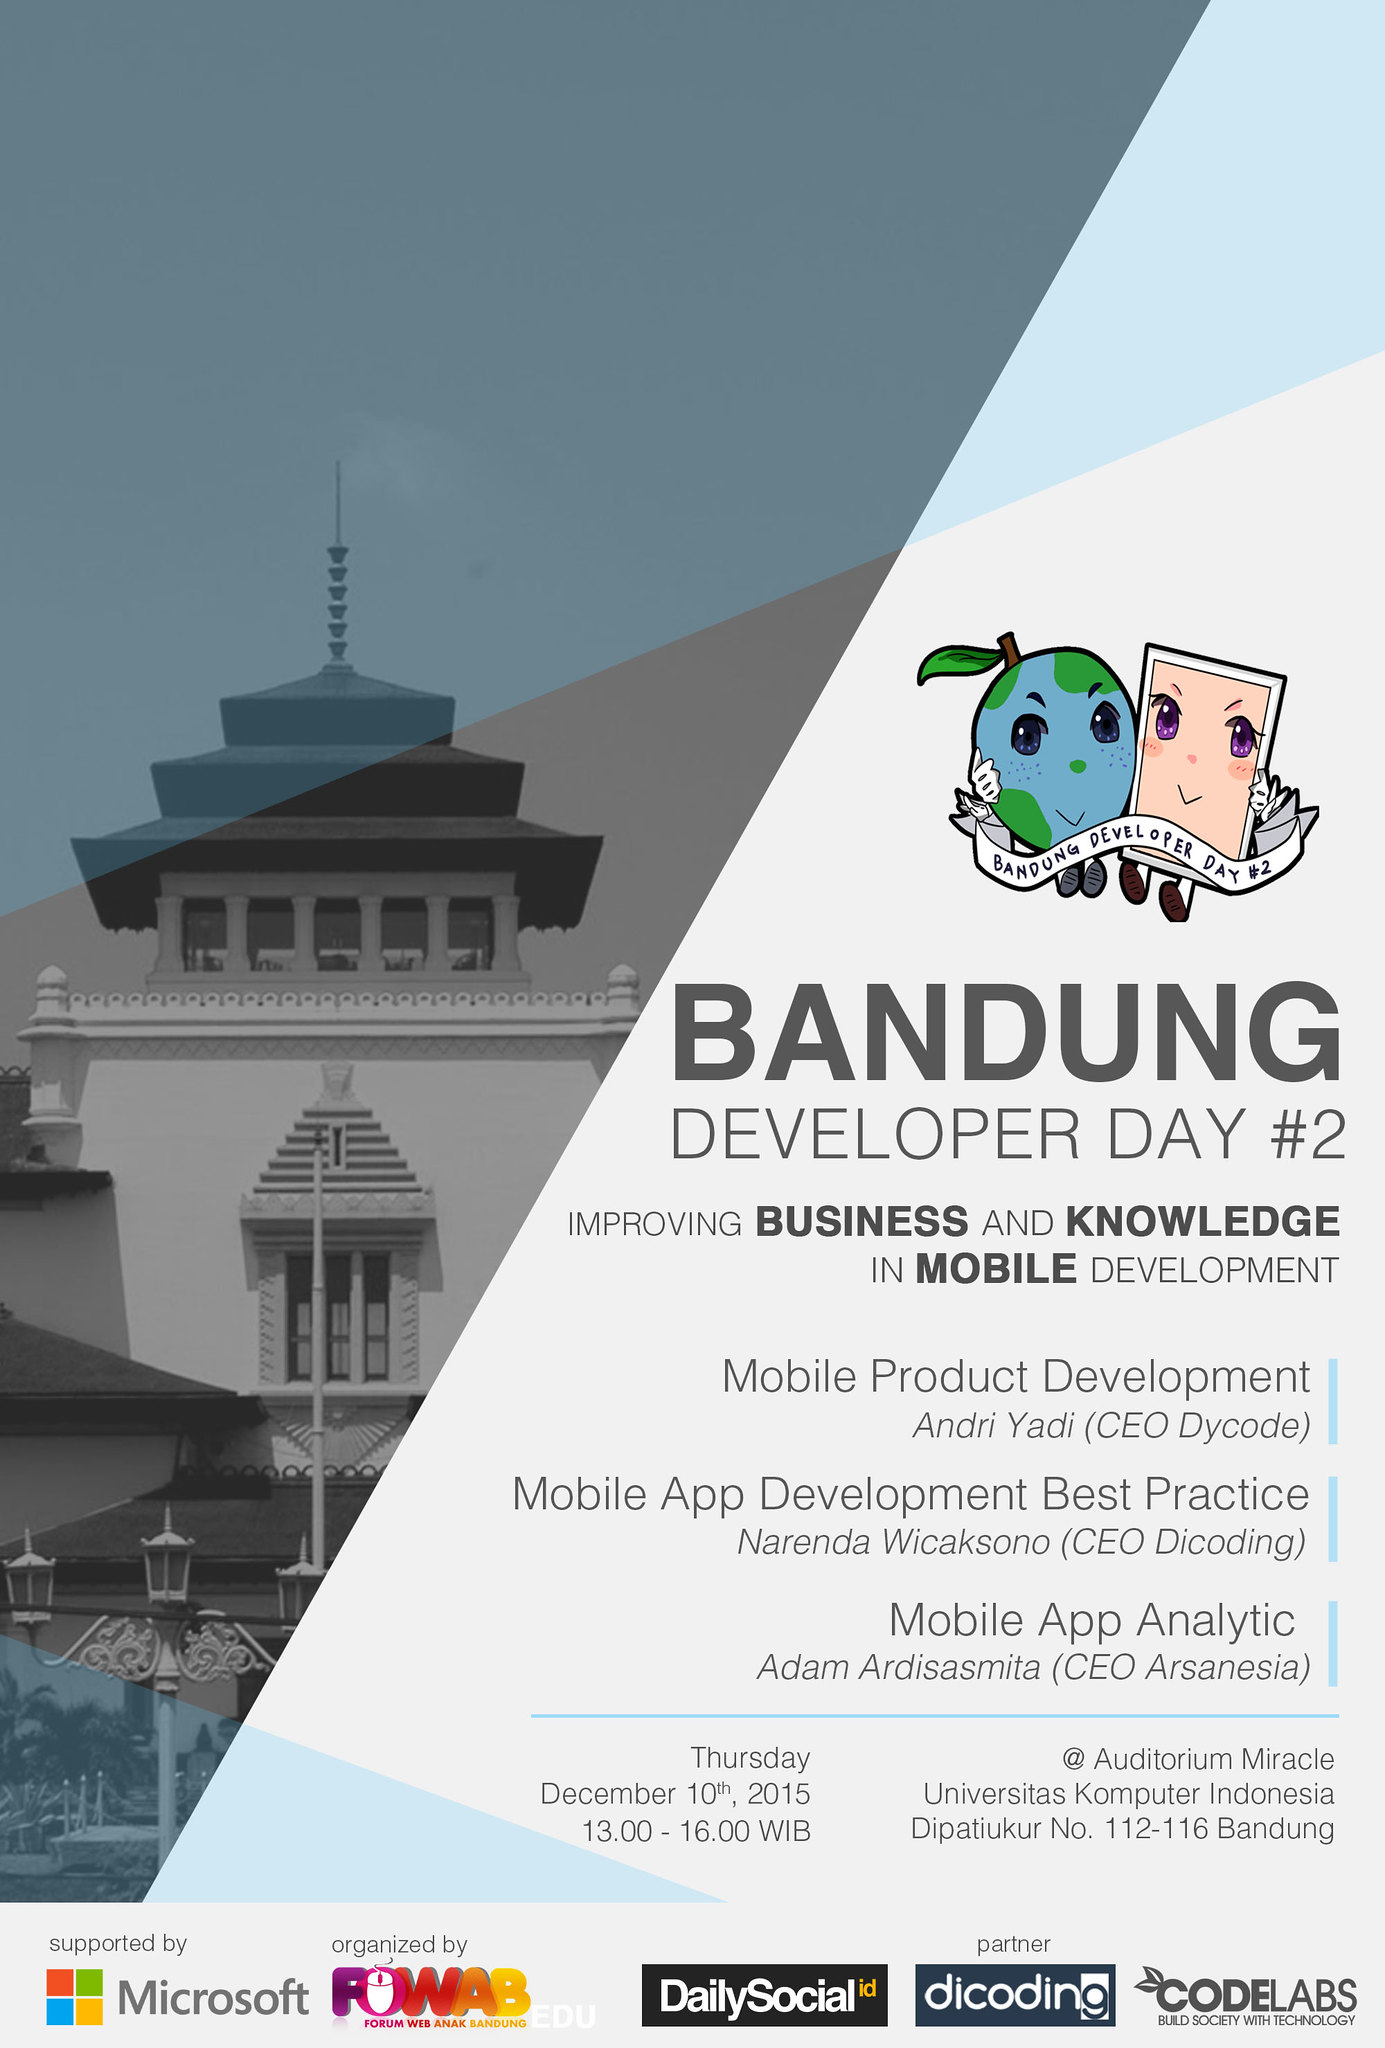 Bandung Developer Day